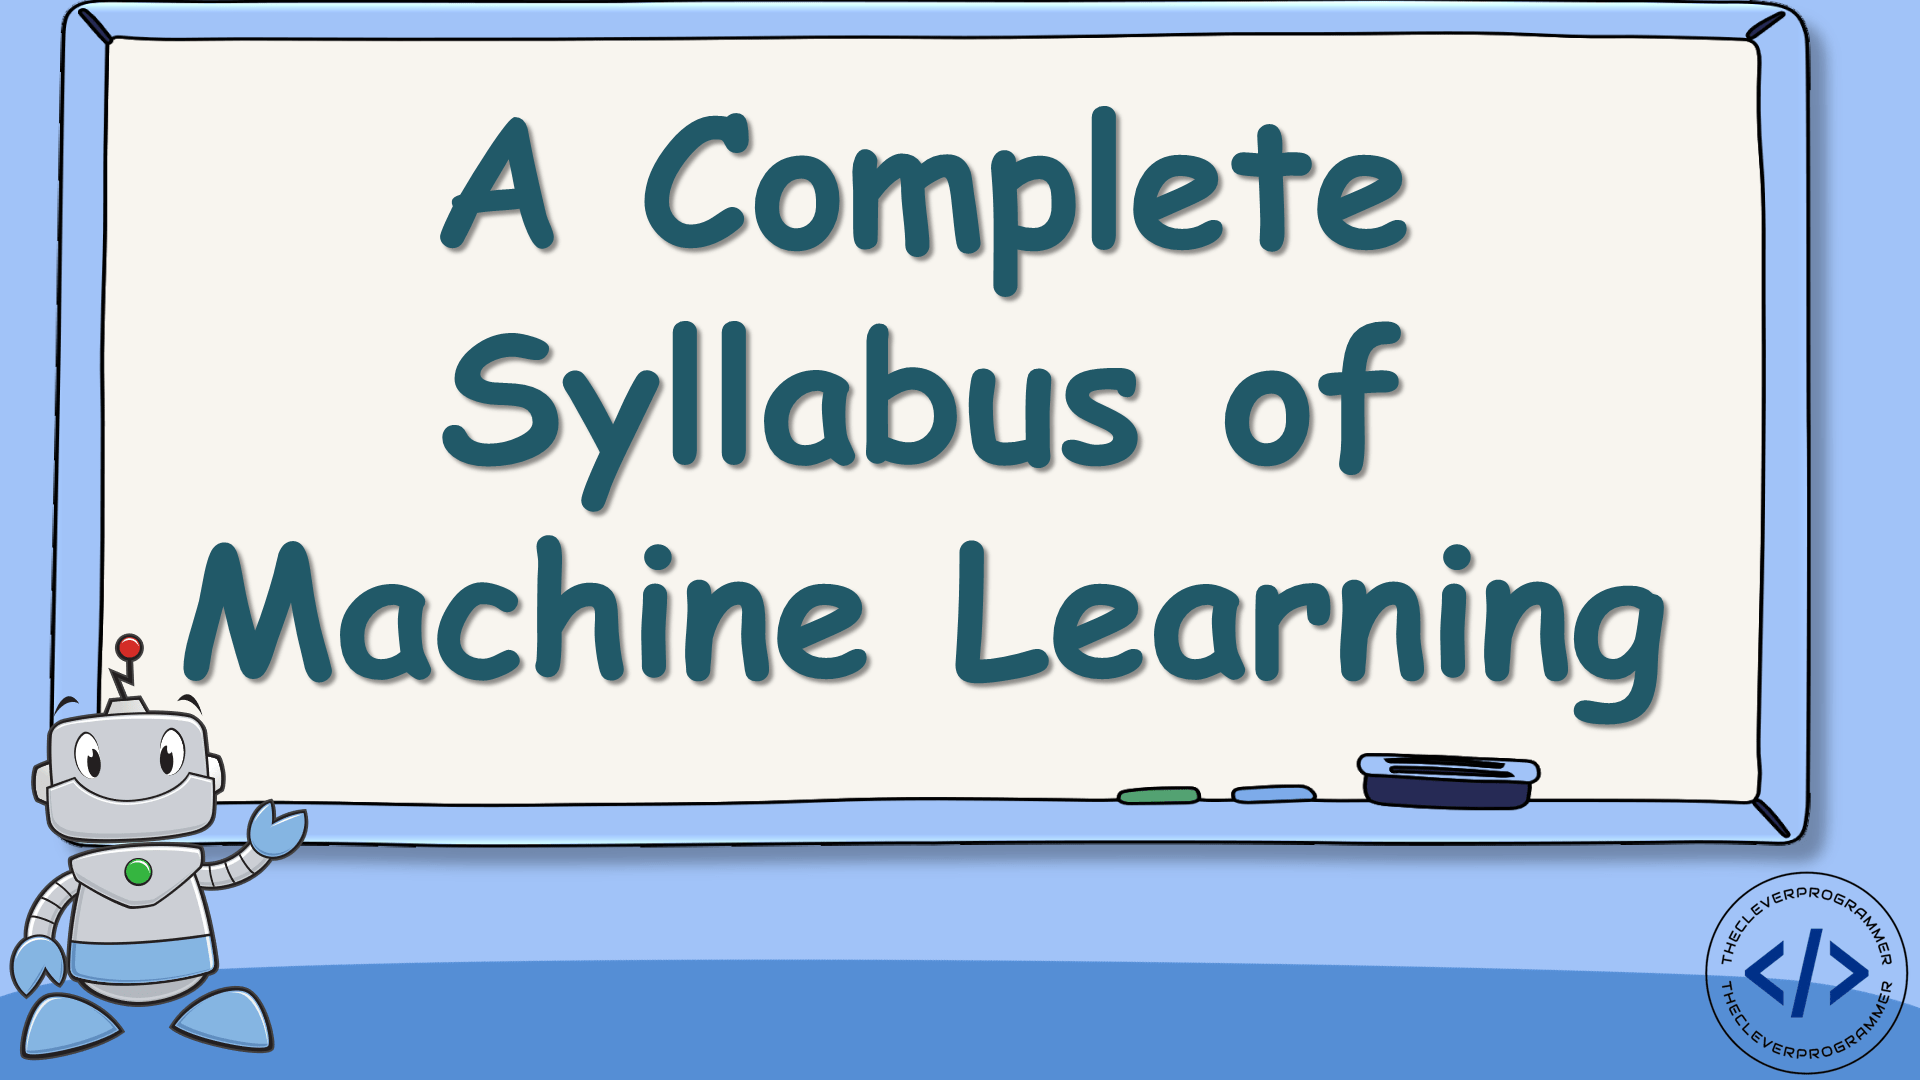 Syllabus of Machine Learning